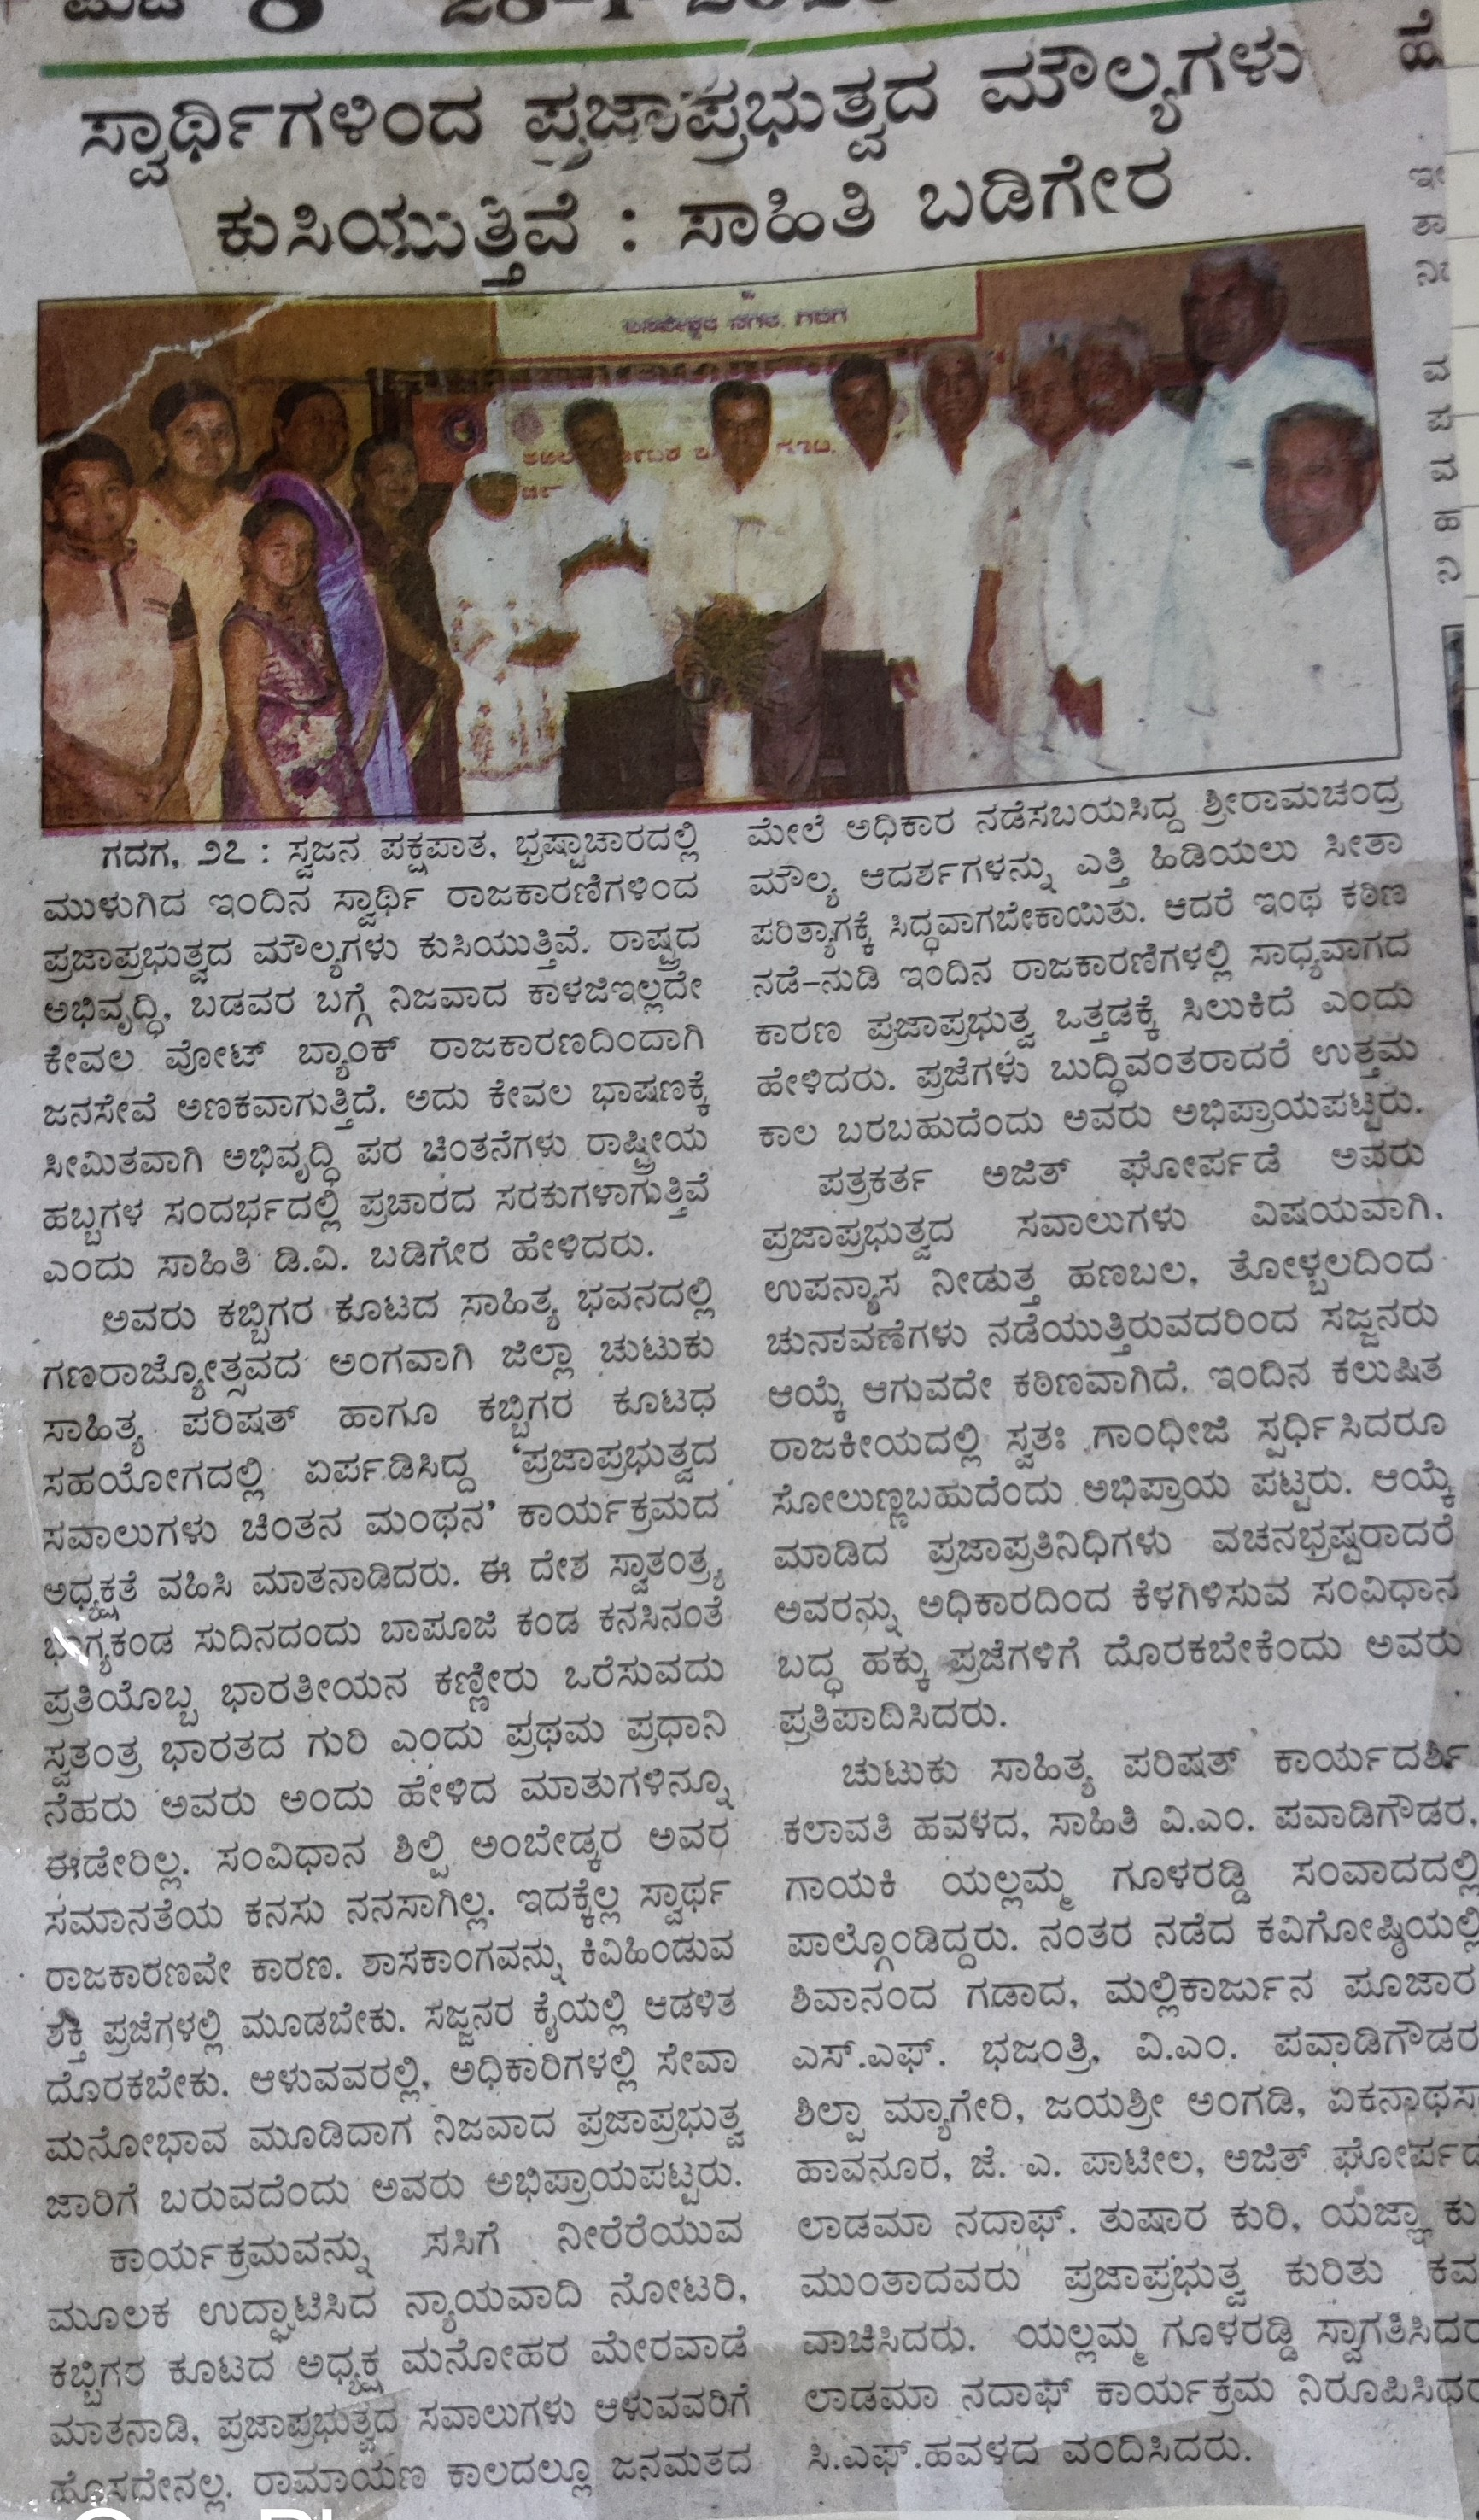 /media/akkkt/1NGO-00374-Akhila_Karnataka_Kabbigara_Koota_Trust_Gadag-Paper_Media_Coverage-2.jpg